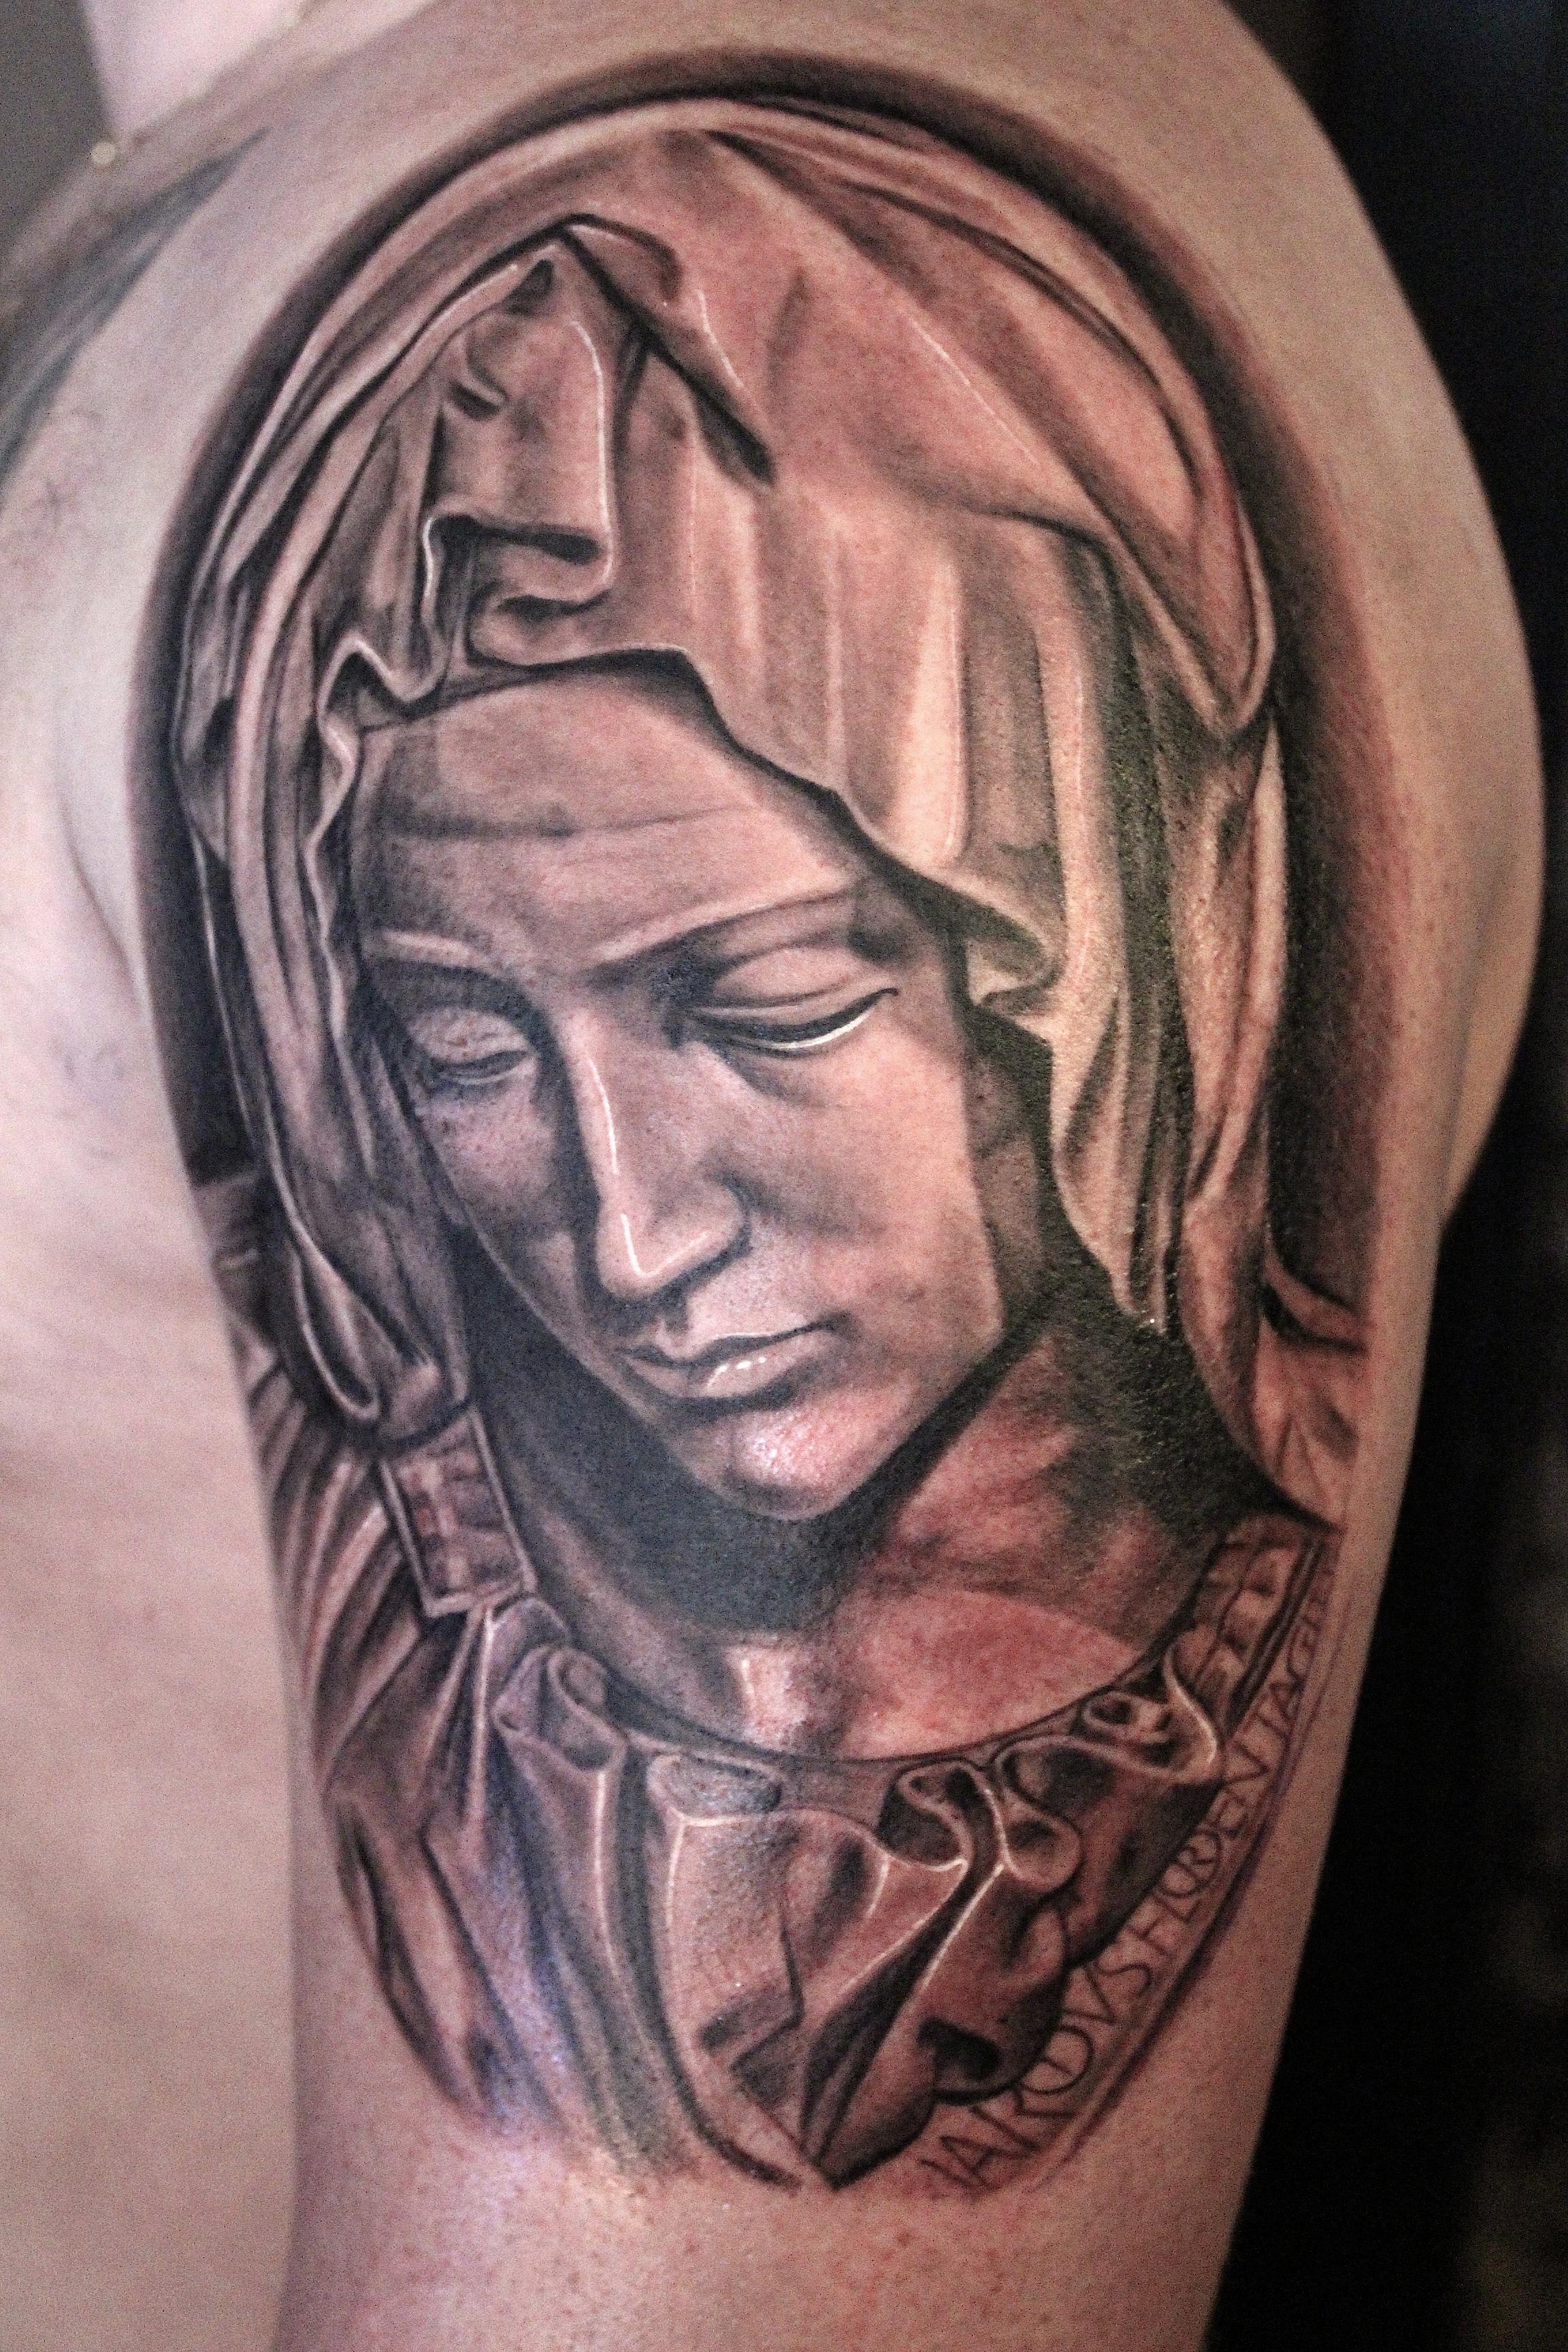 Electrographic tattoo rosenheim,Maria,pieta